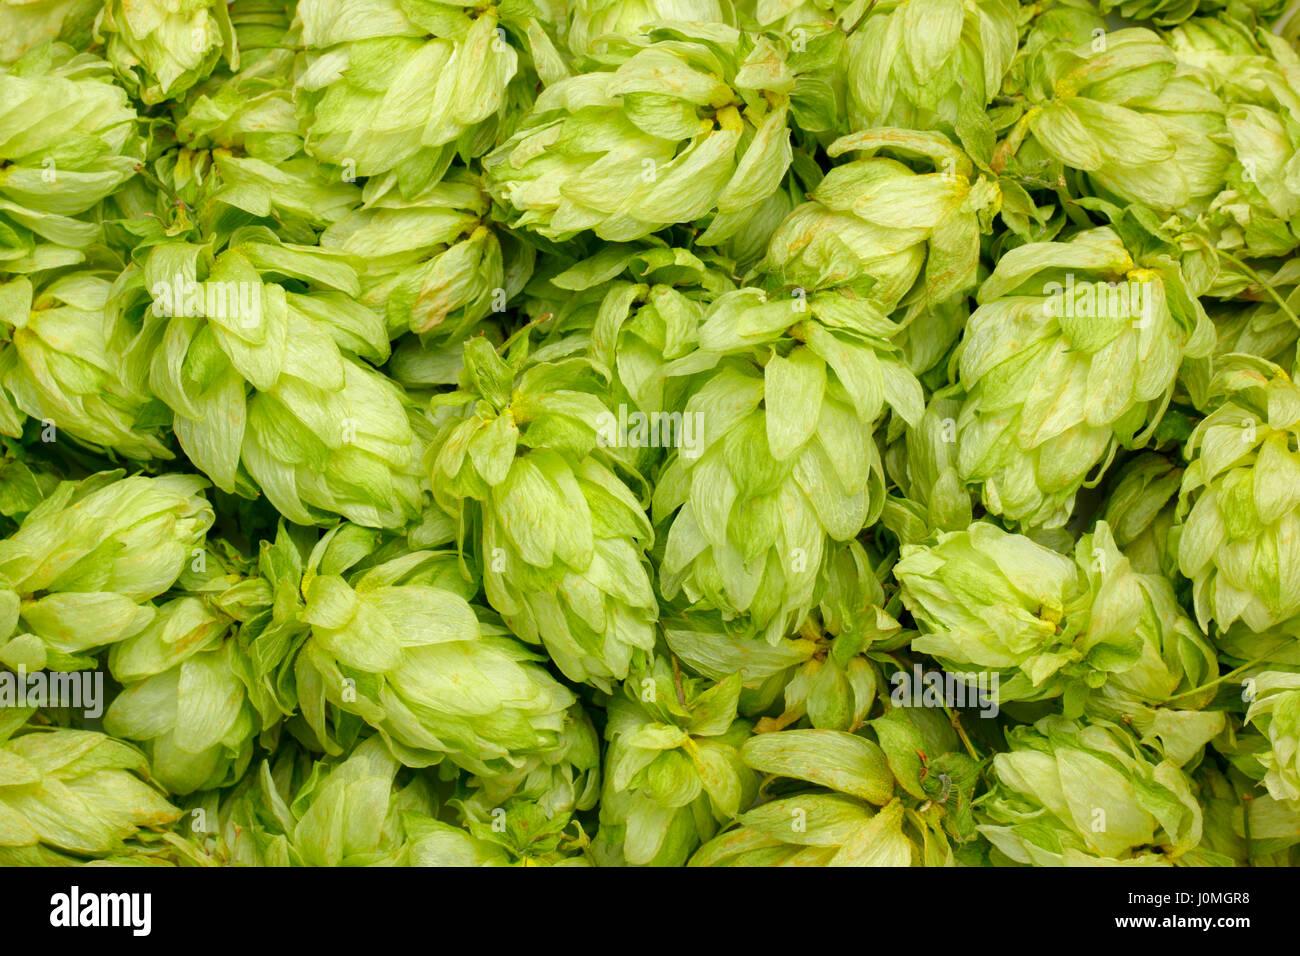 Dried Hop Humulus Lupulus Imágenes De Stock & Dried Hop Humulus ...